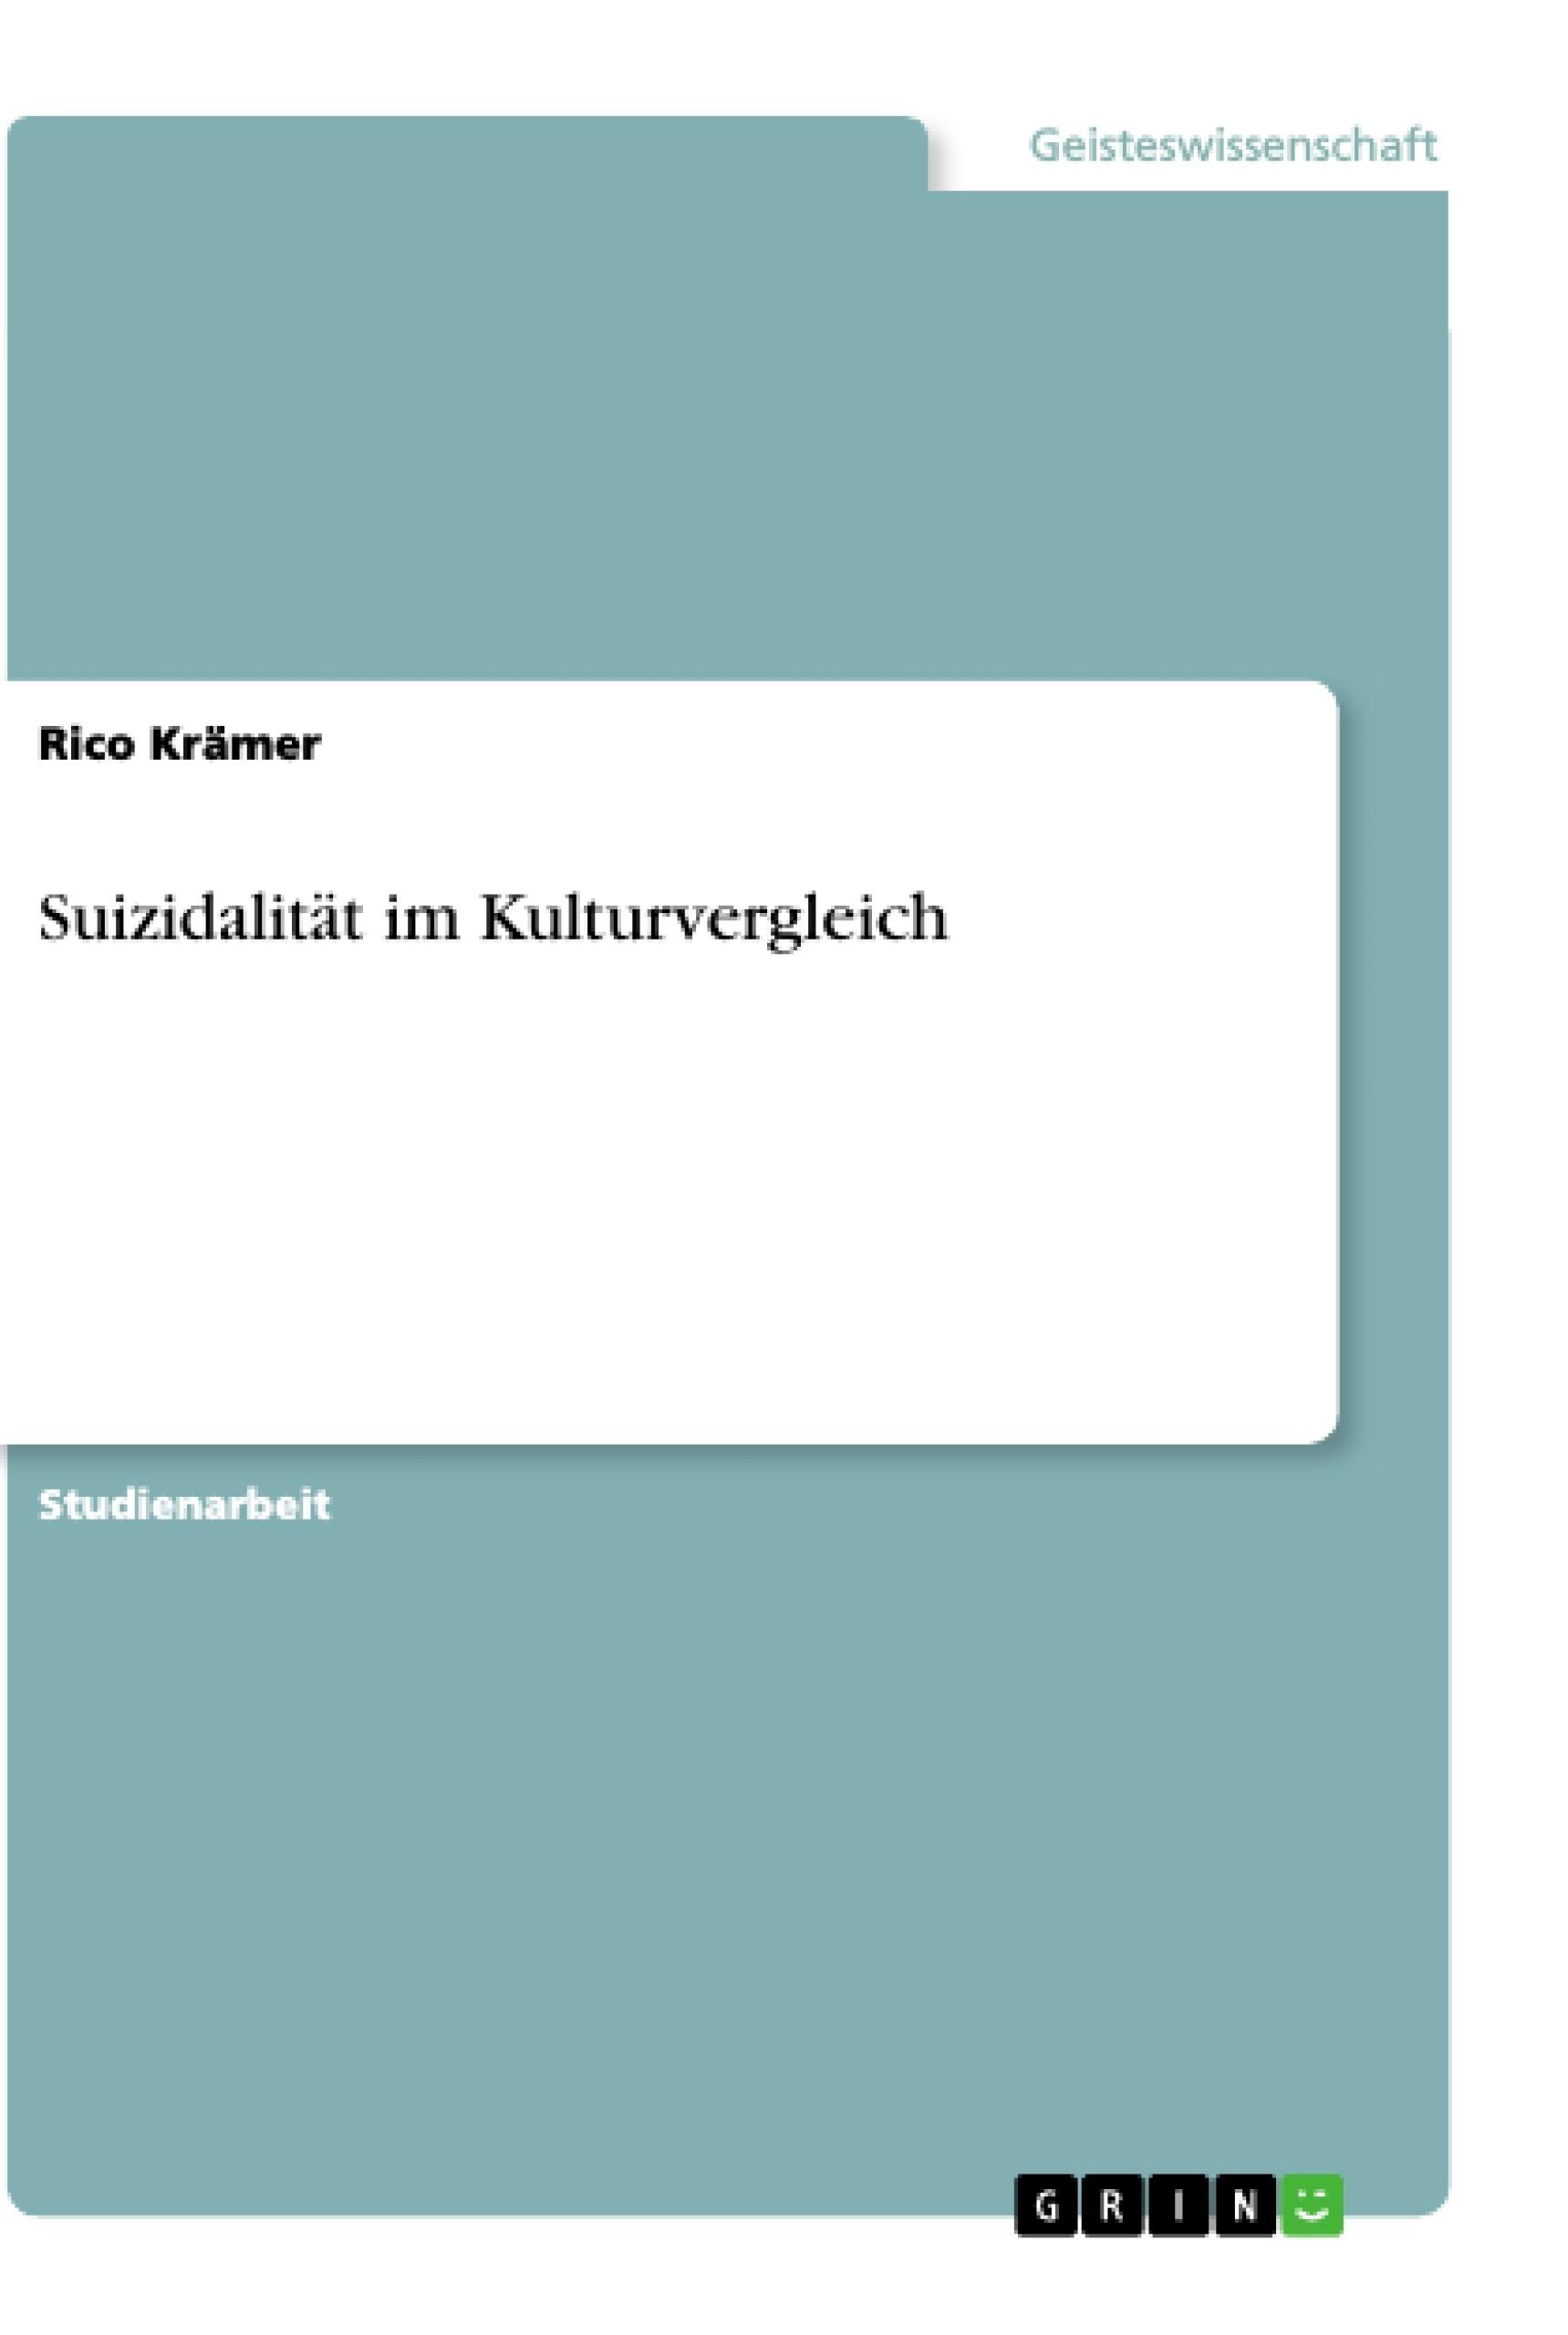 Titel: Suizidalität im Kulturvergleich